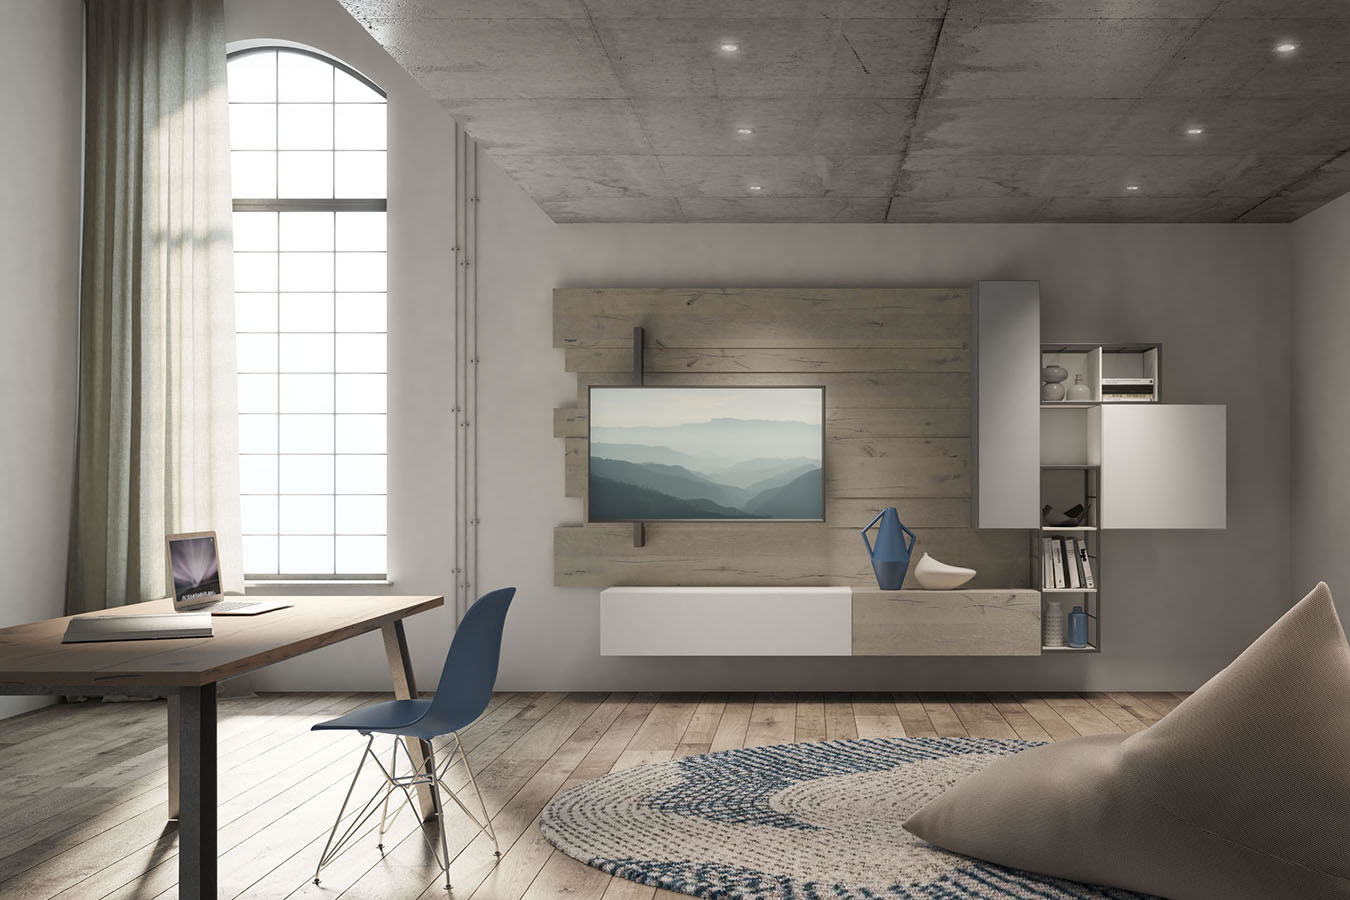 latest italian sofa designs albion reviews momentoitalia furniture blog news from the 2016